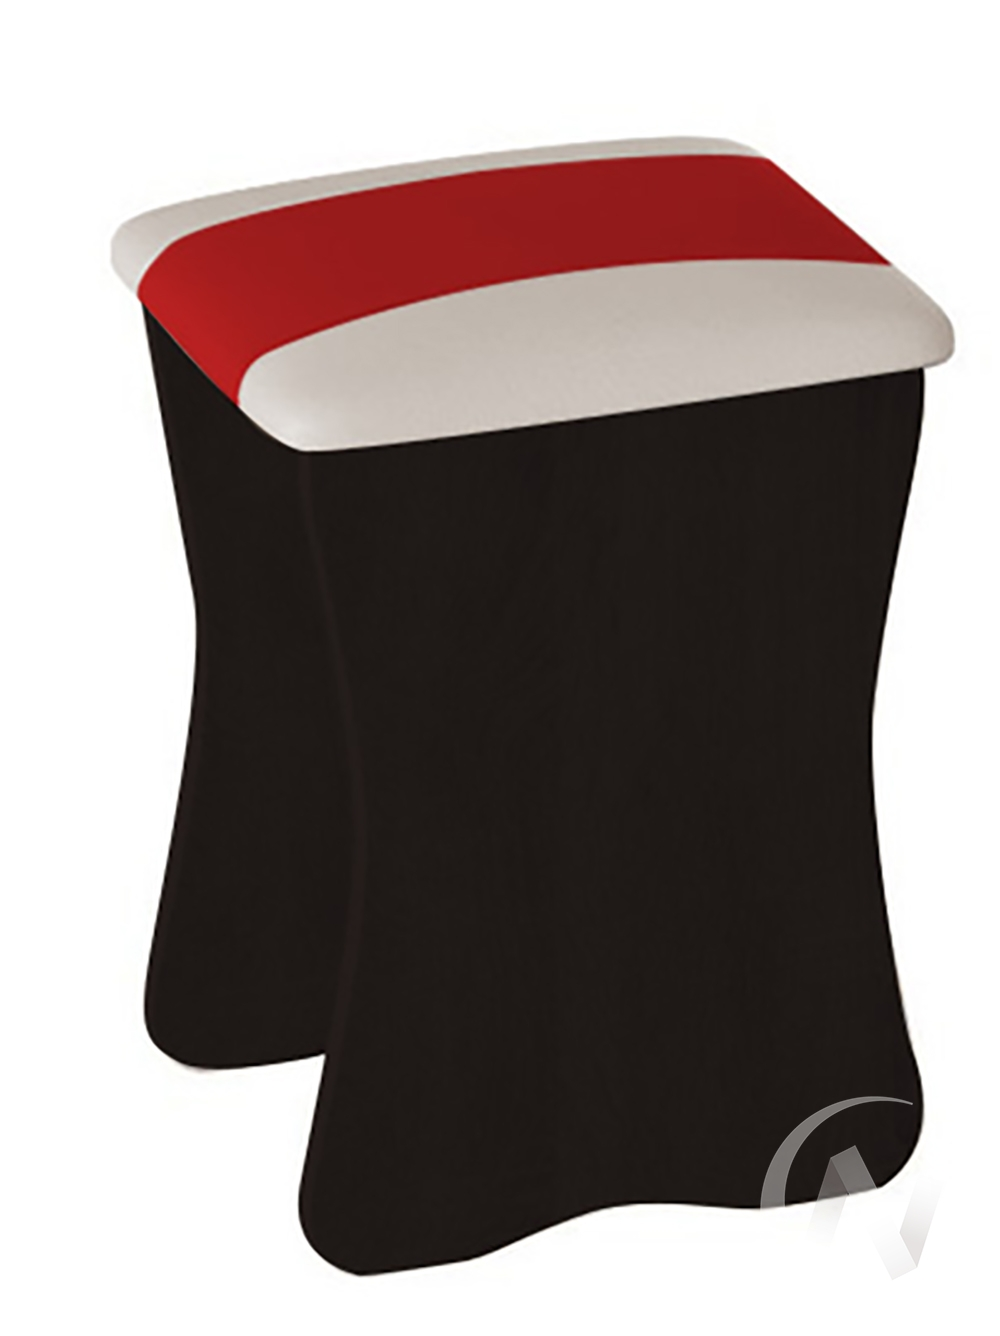 Табурет (венге белый+красный) комплект 2 шт.